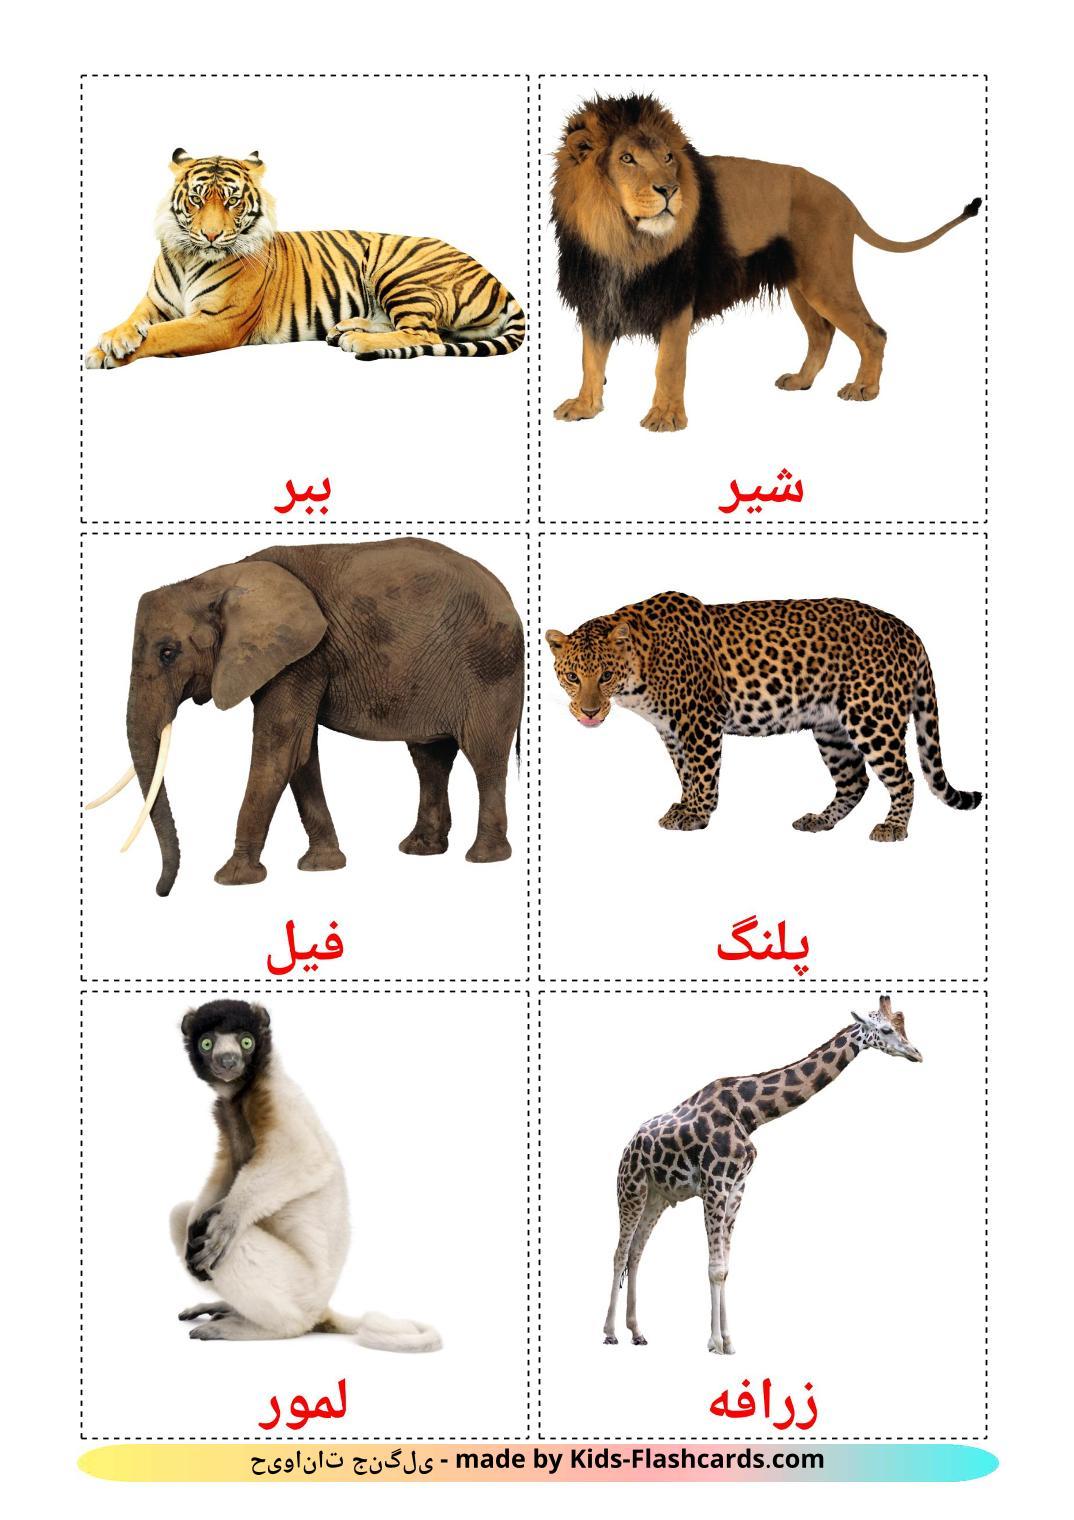 Jungle animals - 21 Free Printable persian Flashcards